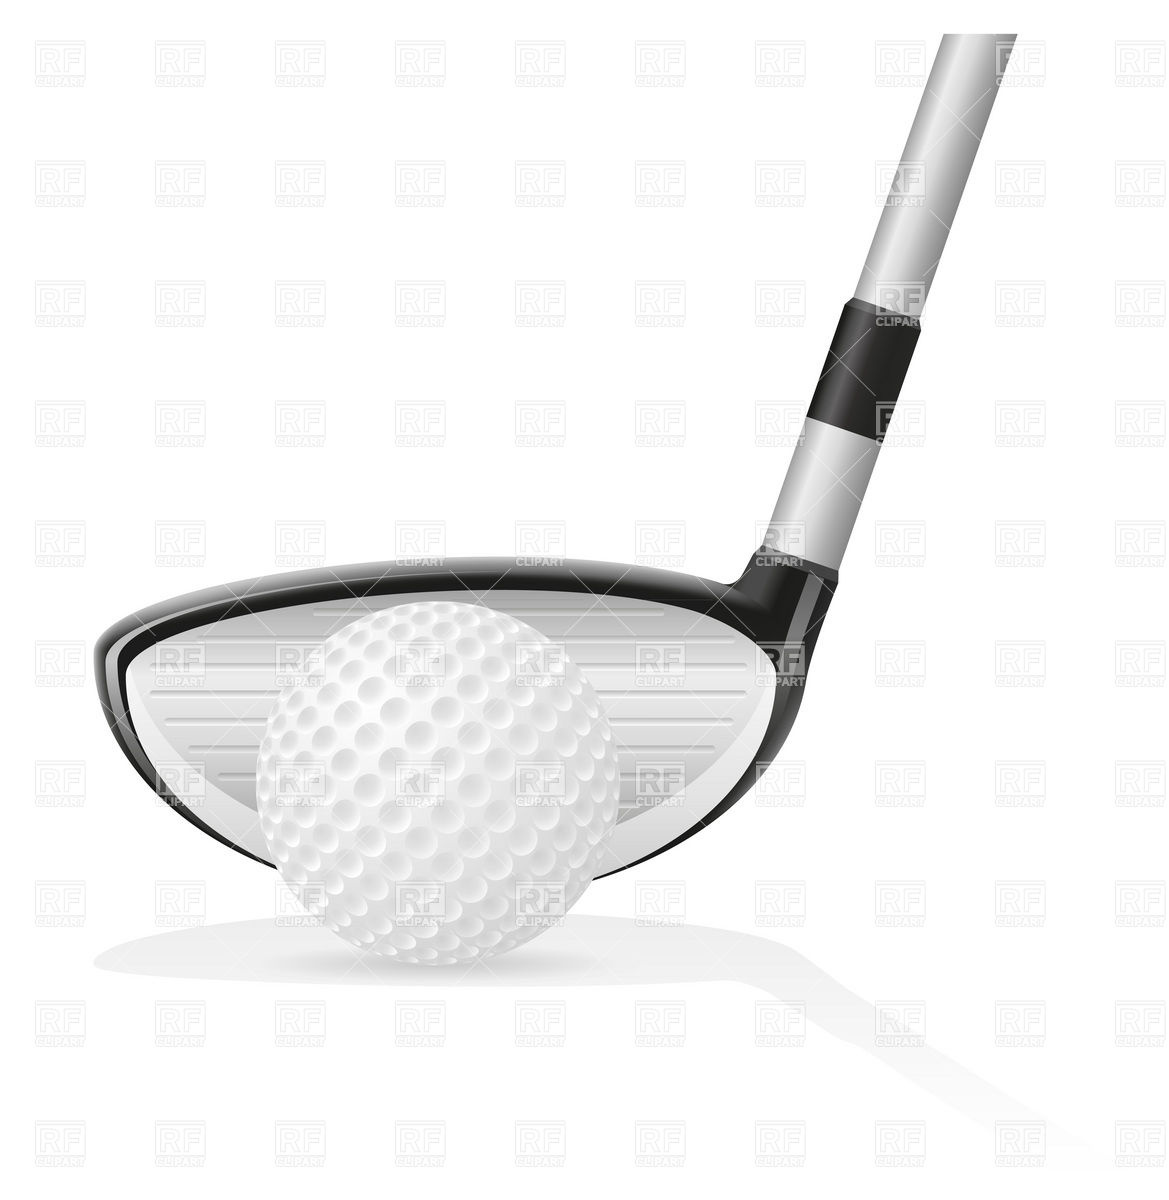 1169x1200 Golf Ball And Iron Golf Club Vector Image Vector Artwork Of